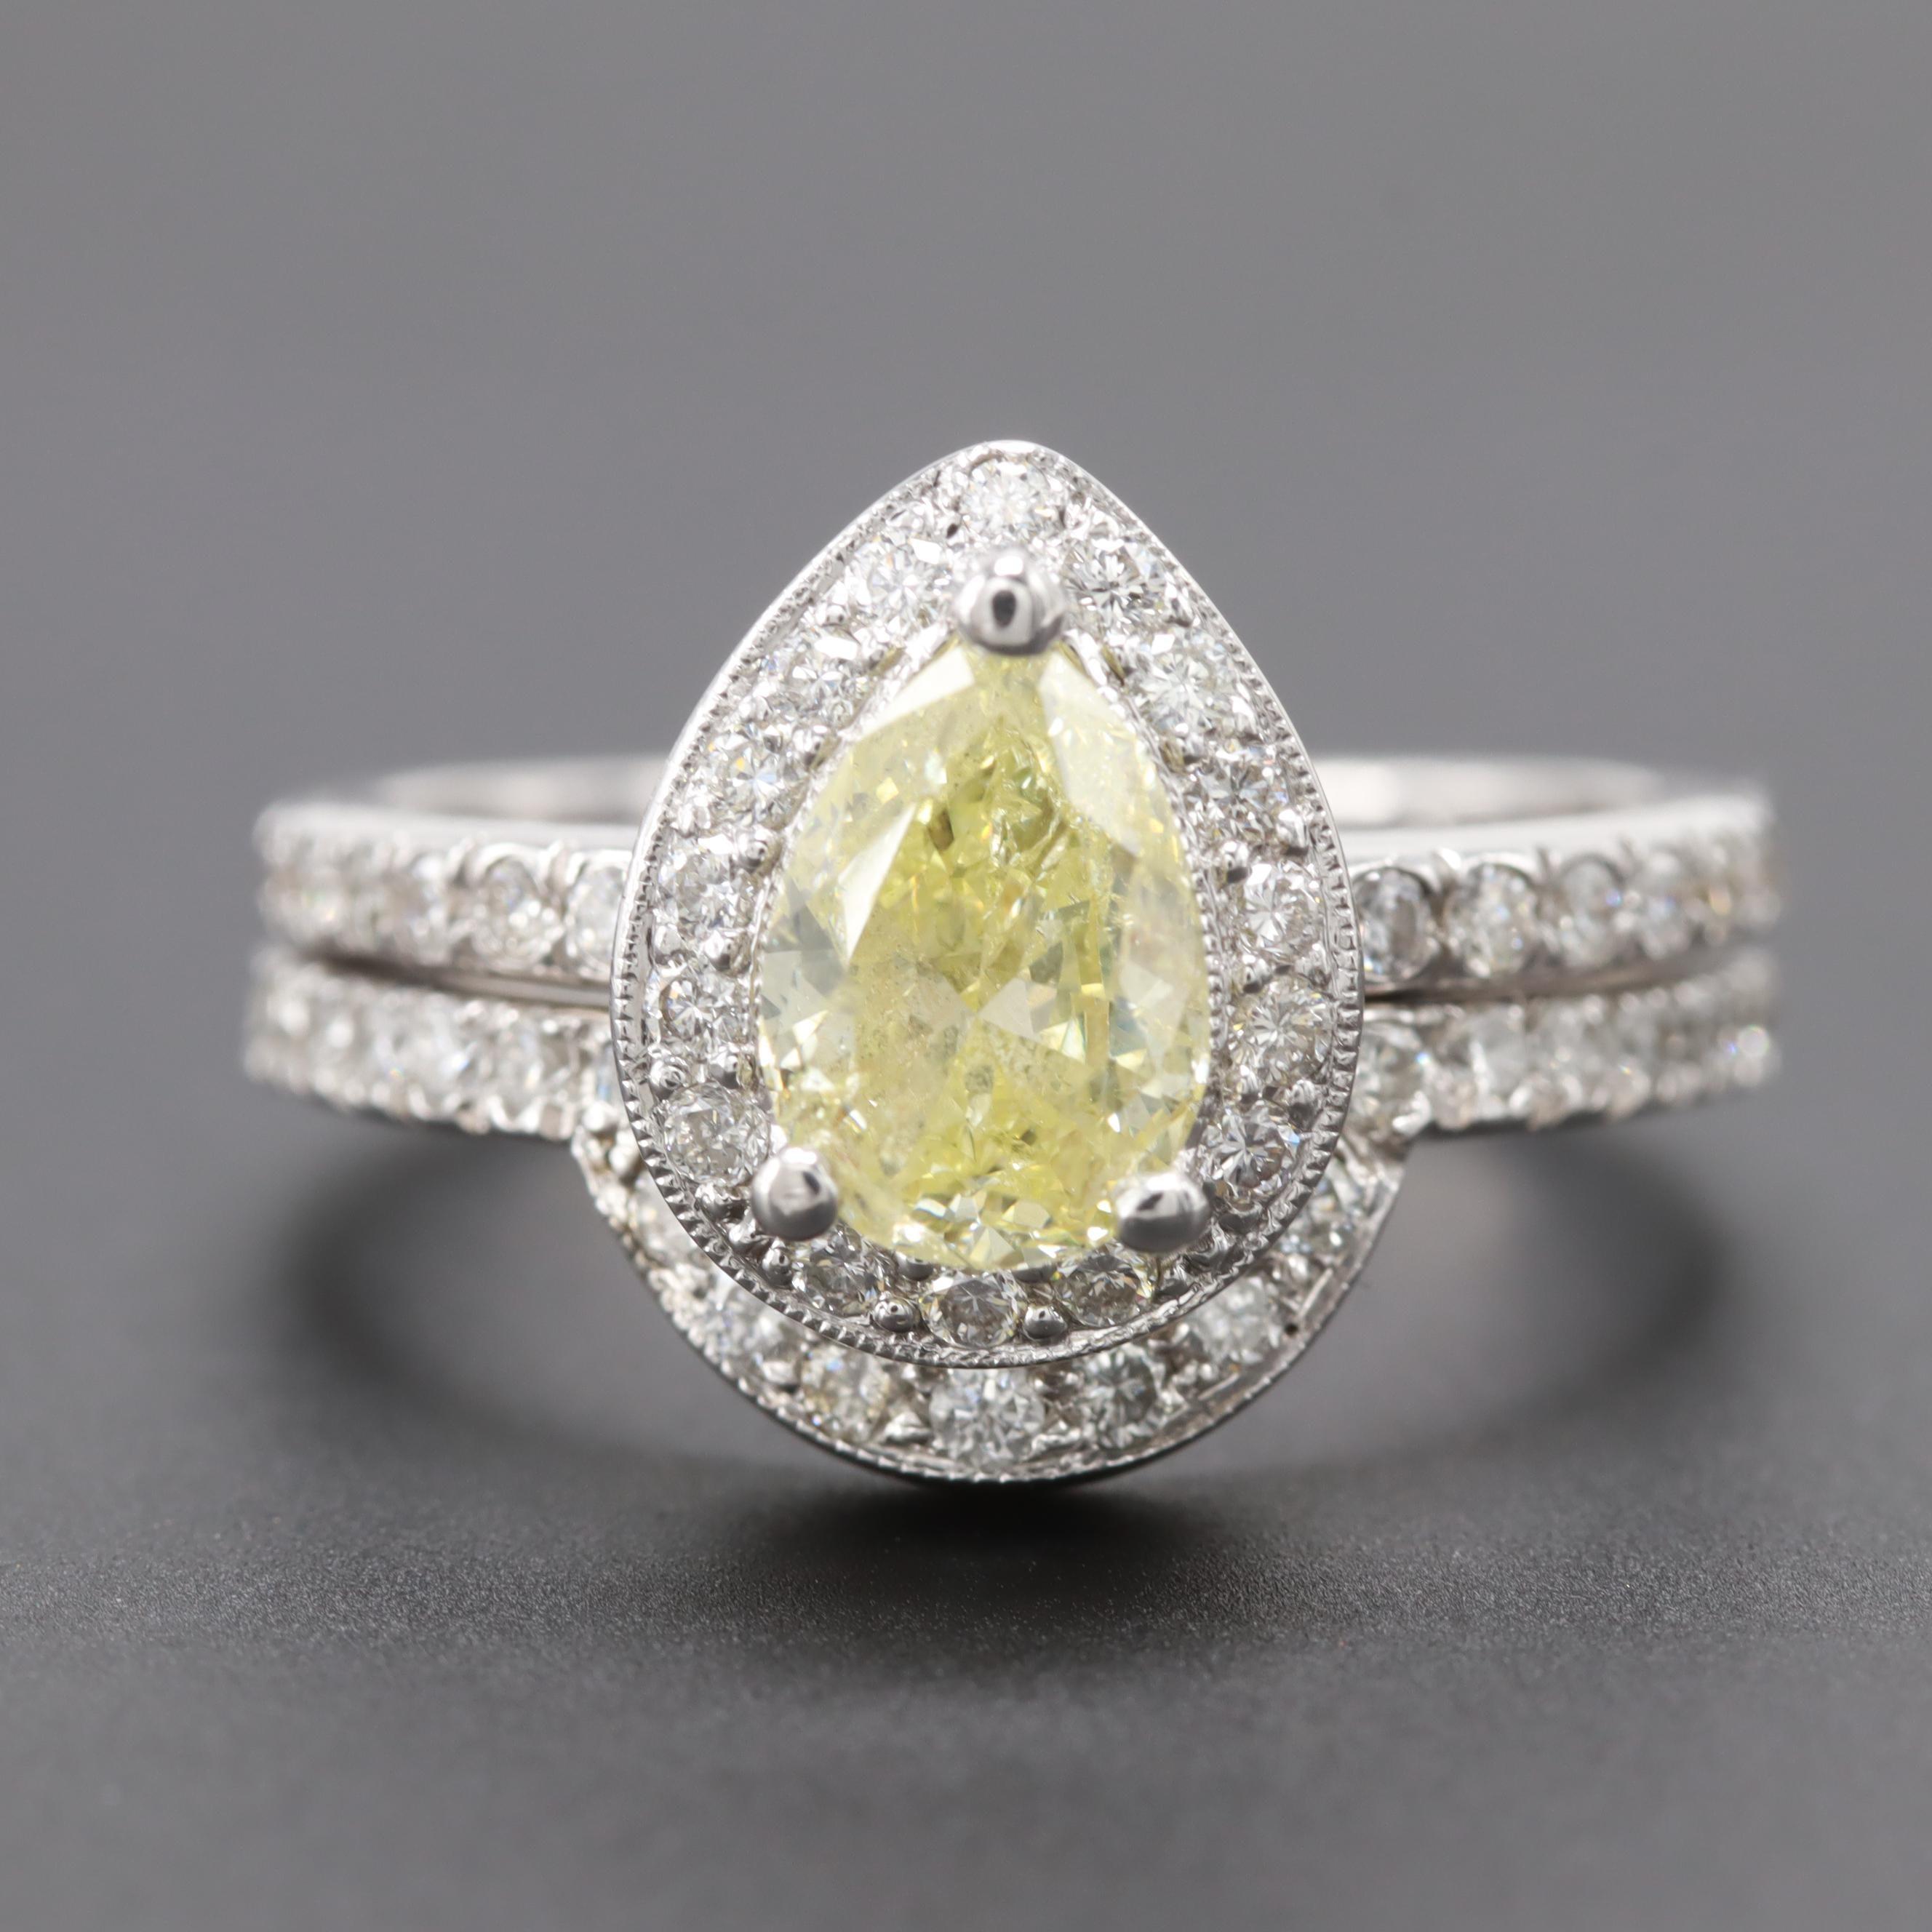 14K White Gold 1.70 CTW Diamond Ring Set With 0.95 CT Yellow Pear Diamond